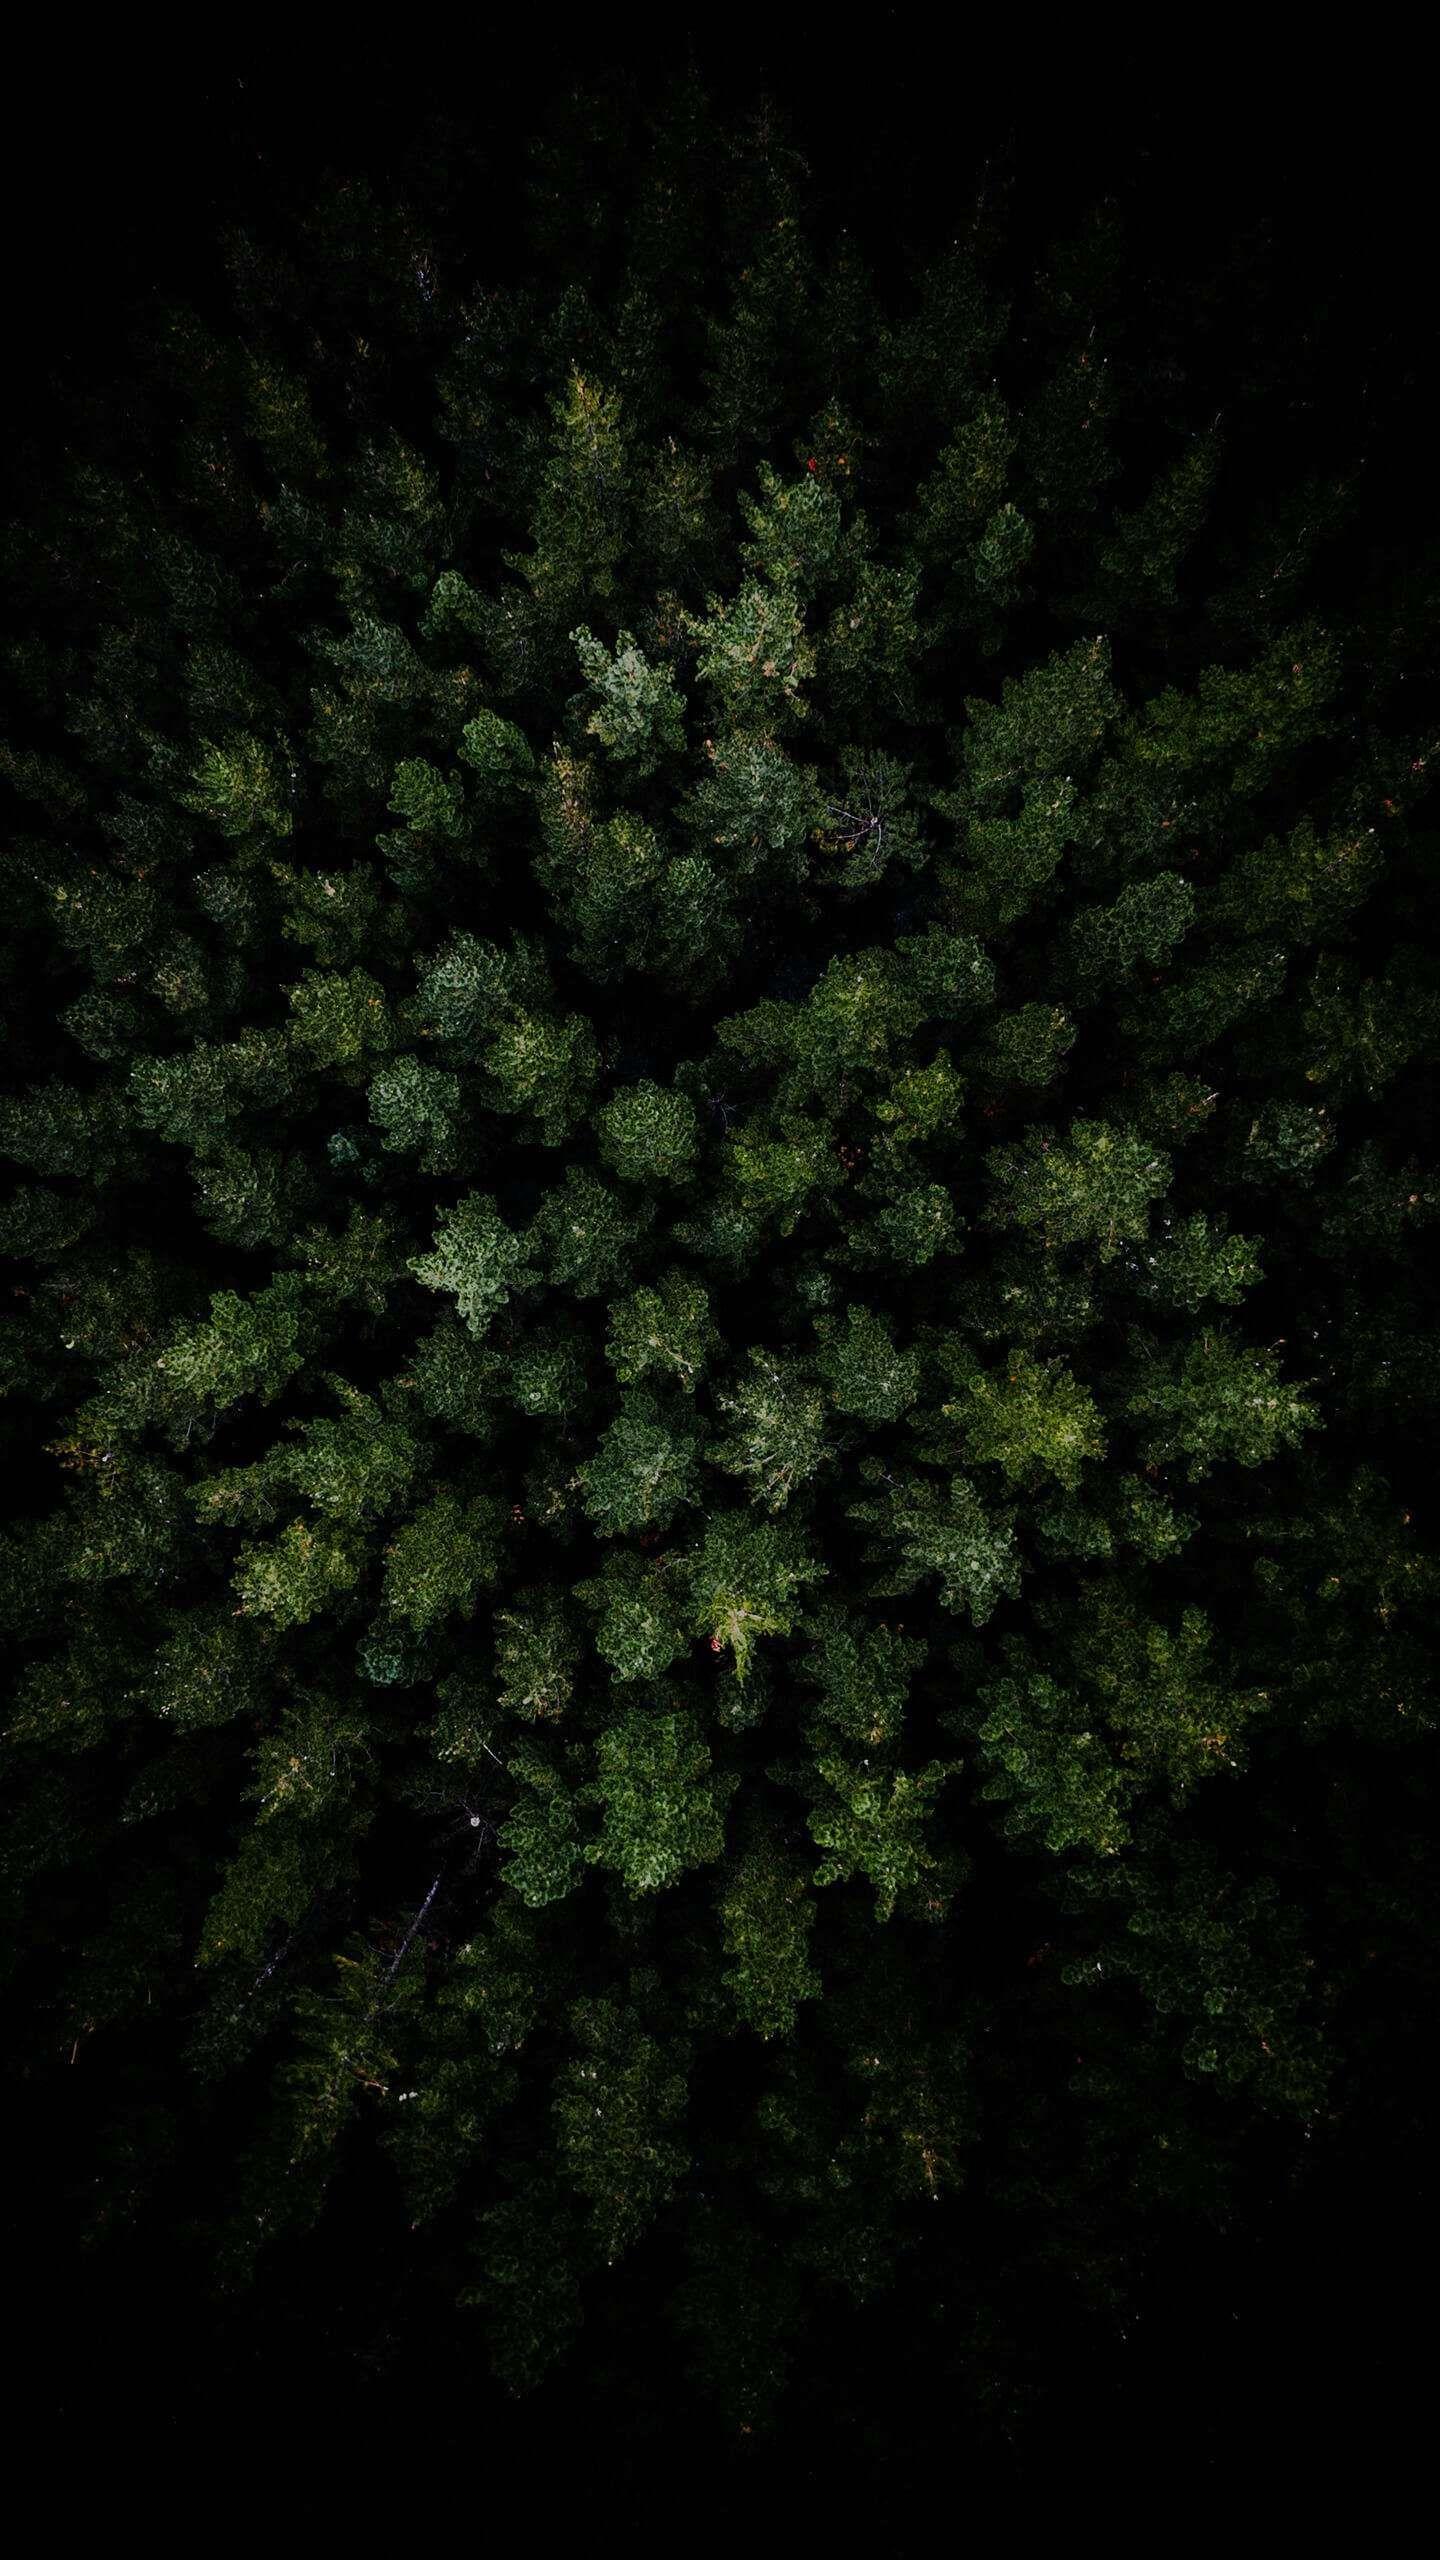 Dark Forest Aerial View Iphone Wallpaper Iphonewallpaper Iphone Wallpaper Android Androidw Forest Wallpaper Iphone Iphone Wallpaper Green Nature Wallpaper